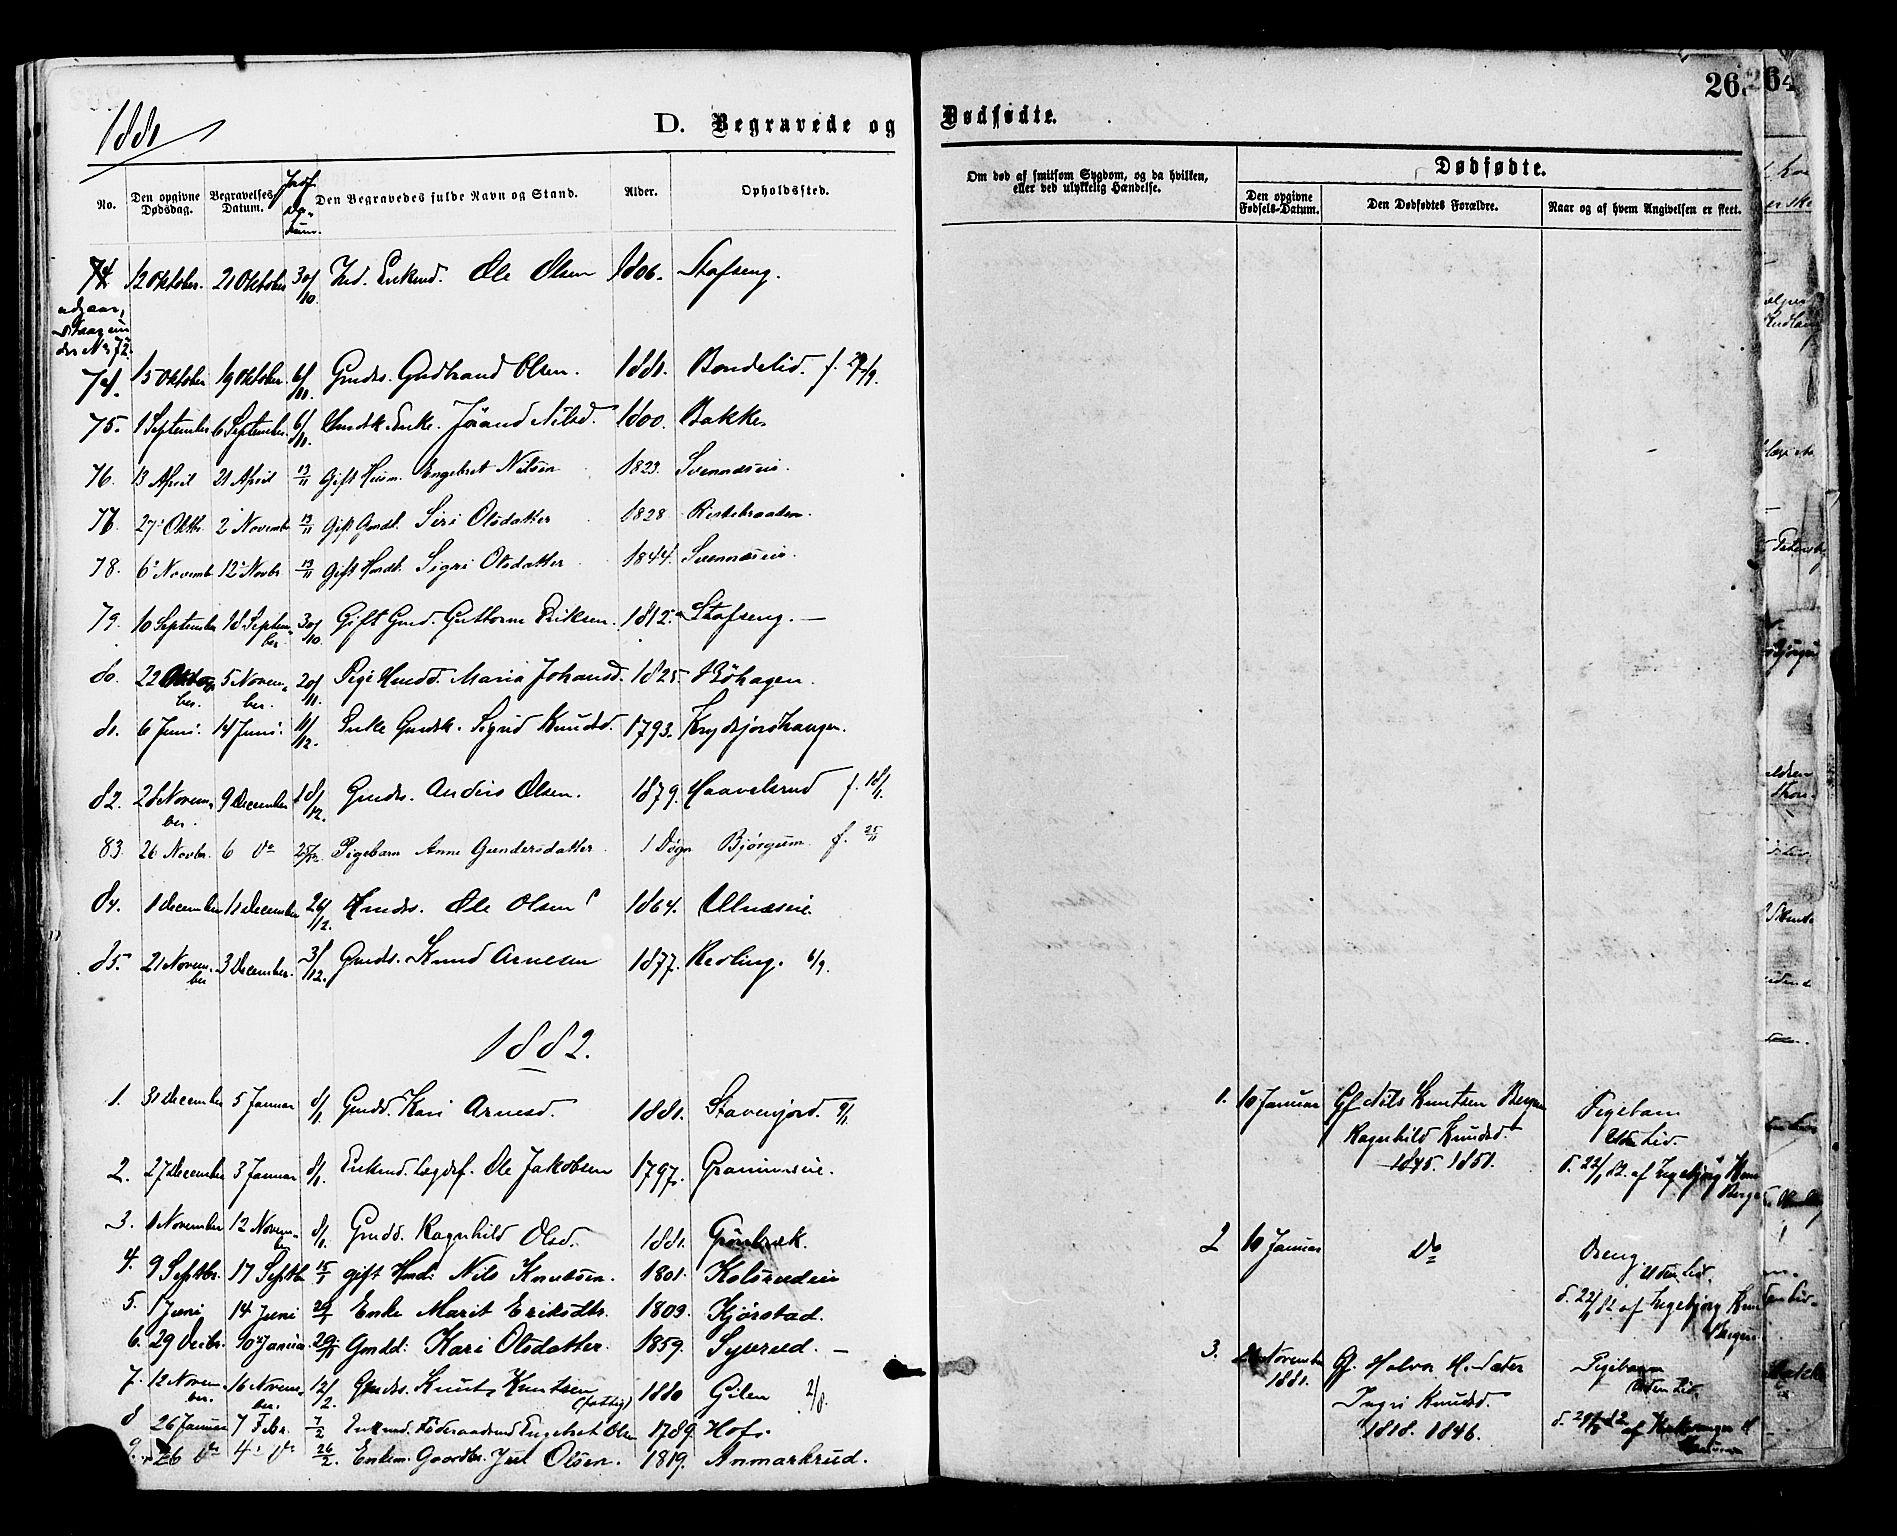 SAH, Nord-Aurdal prestekontor, Ministerialbok nr. 9, 1876-1882, s. 263